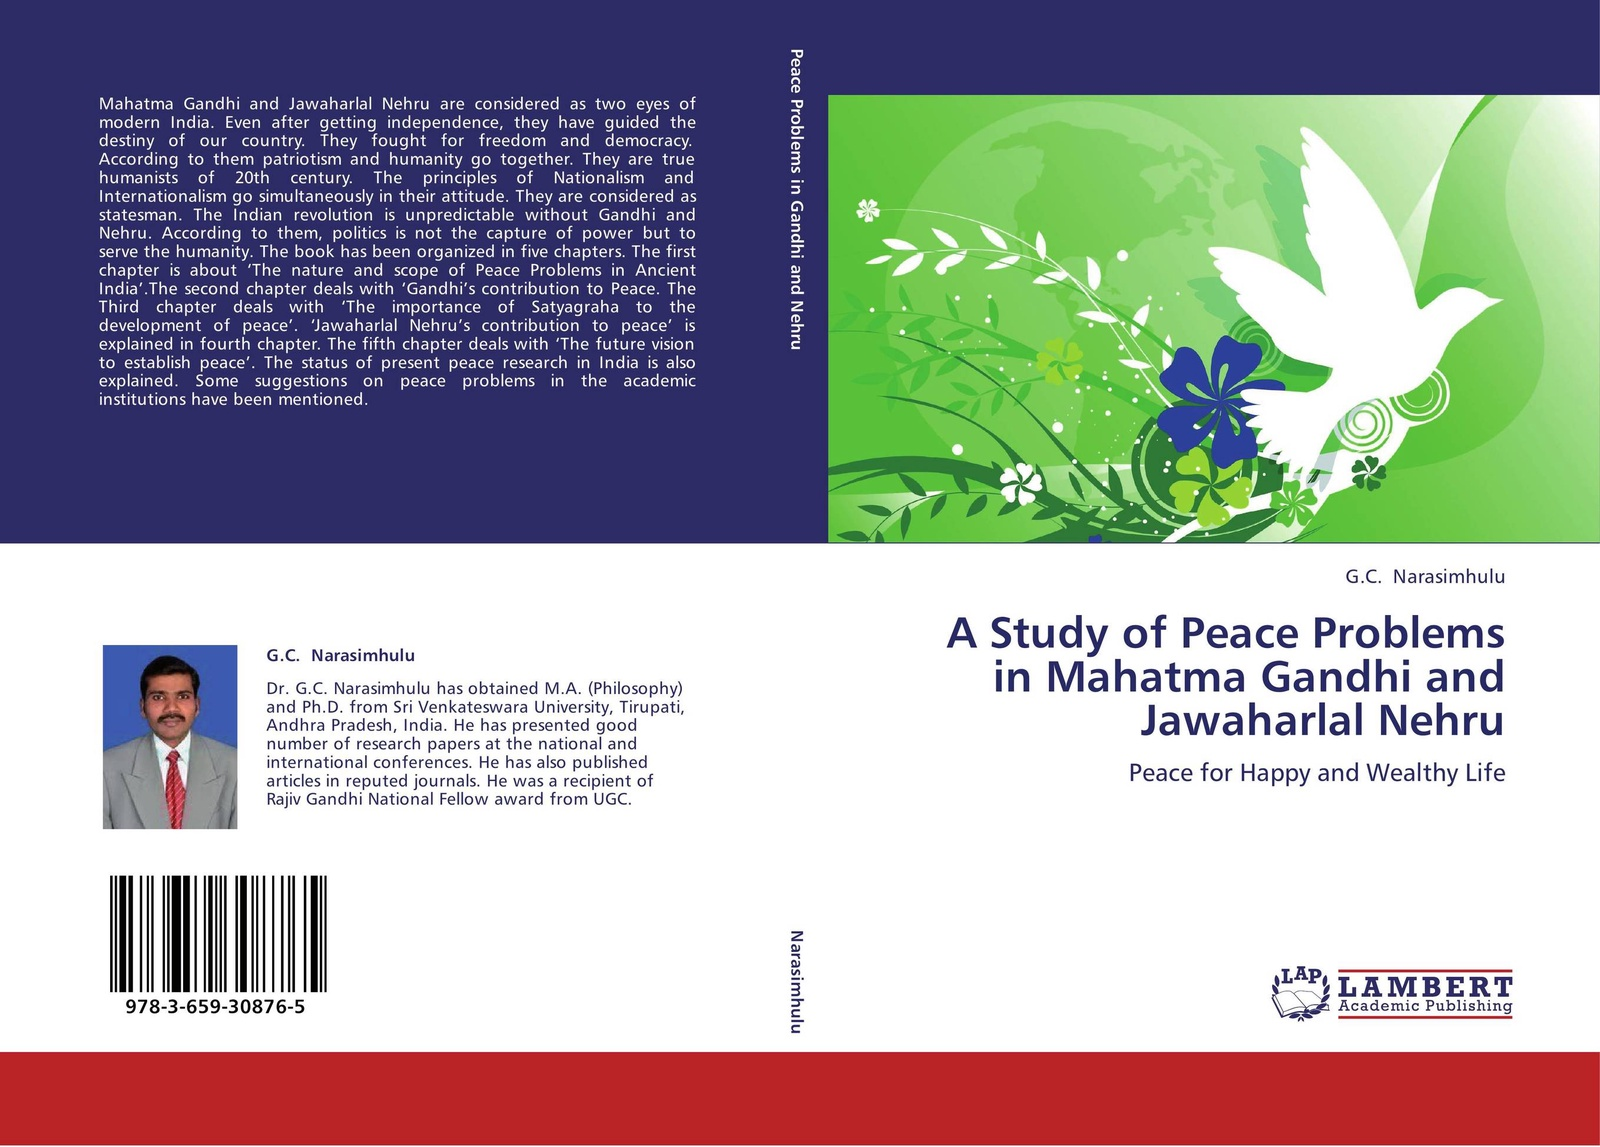 G.C. Narasimhulu A Study of Peace Problems in Mahatma Gandhi and Jawaharlal Nehru gandhi mahatma third class in indian railways